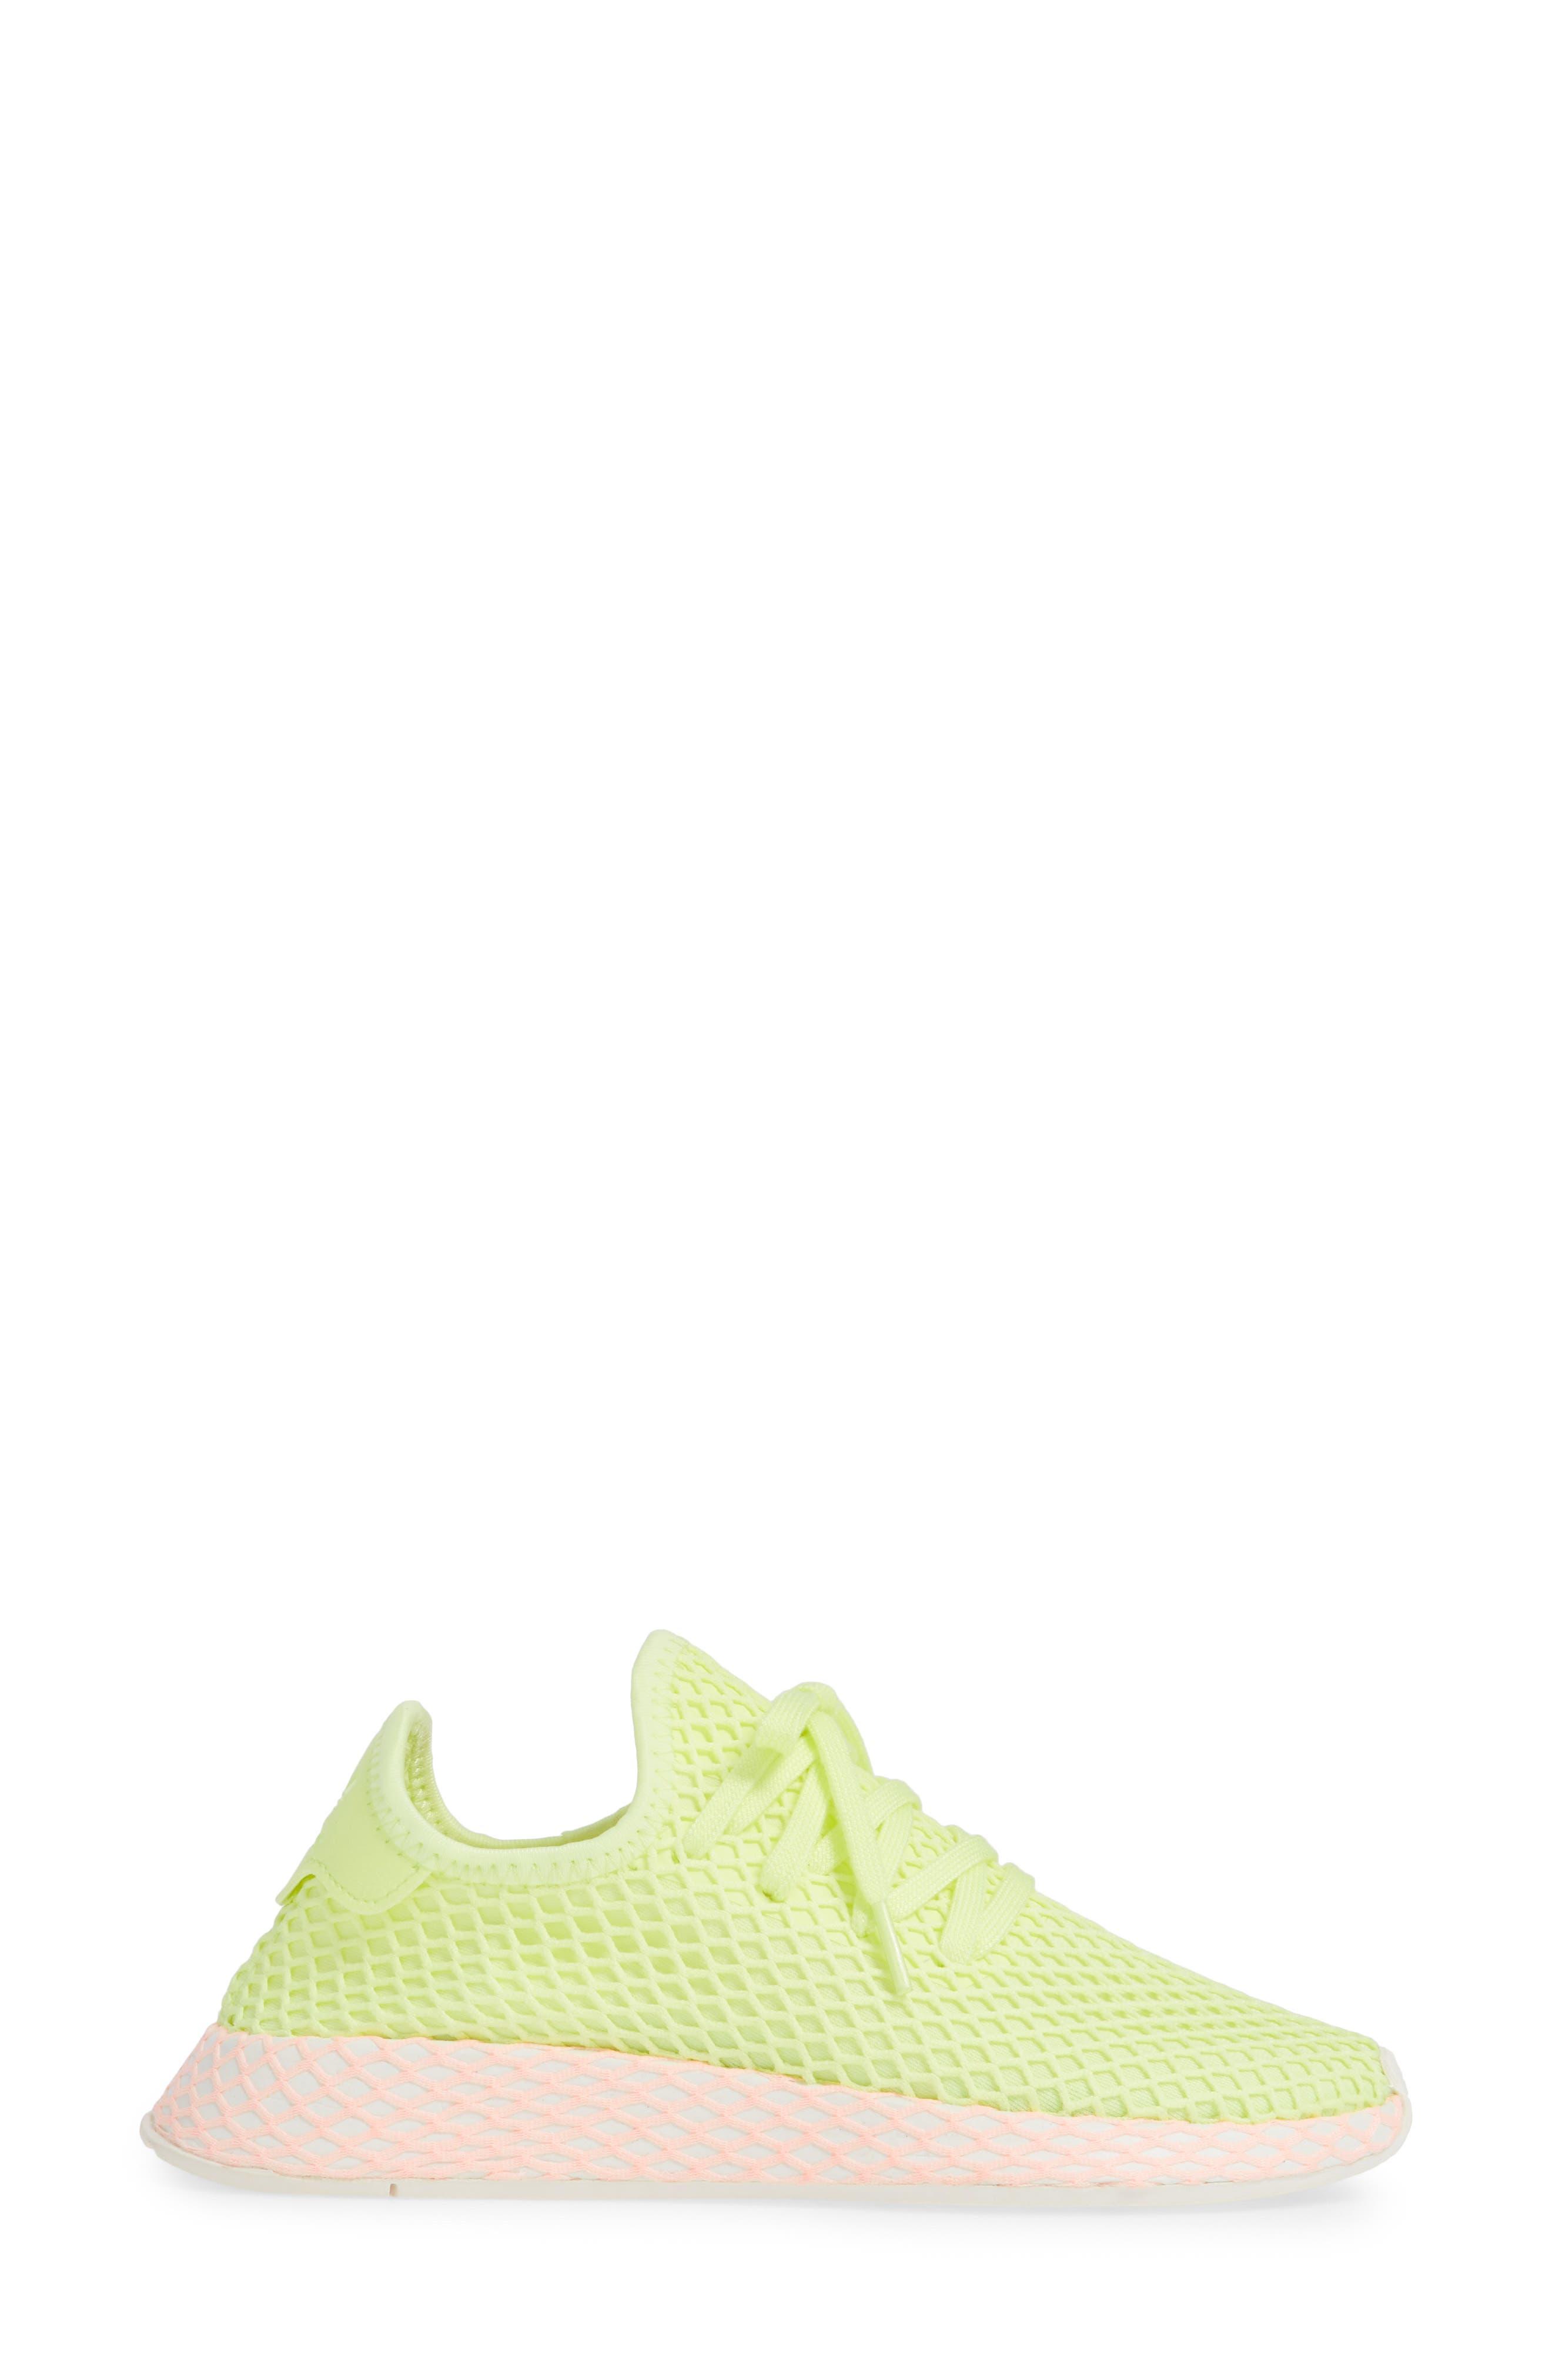 Deerupt Runner Sneaker,                             Alternate thumbnail 3, color,                             GLOW/ GLOW/ CLEAR LILAC